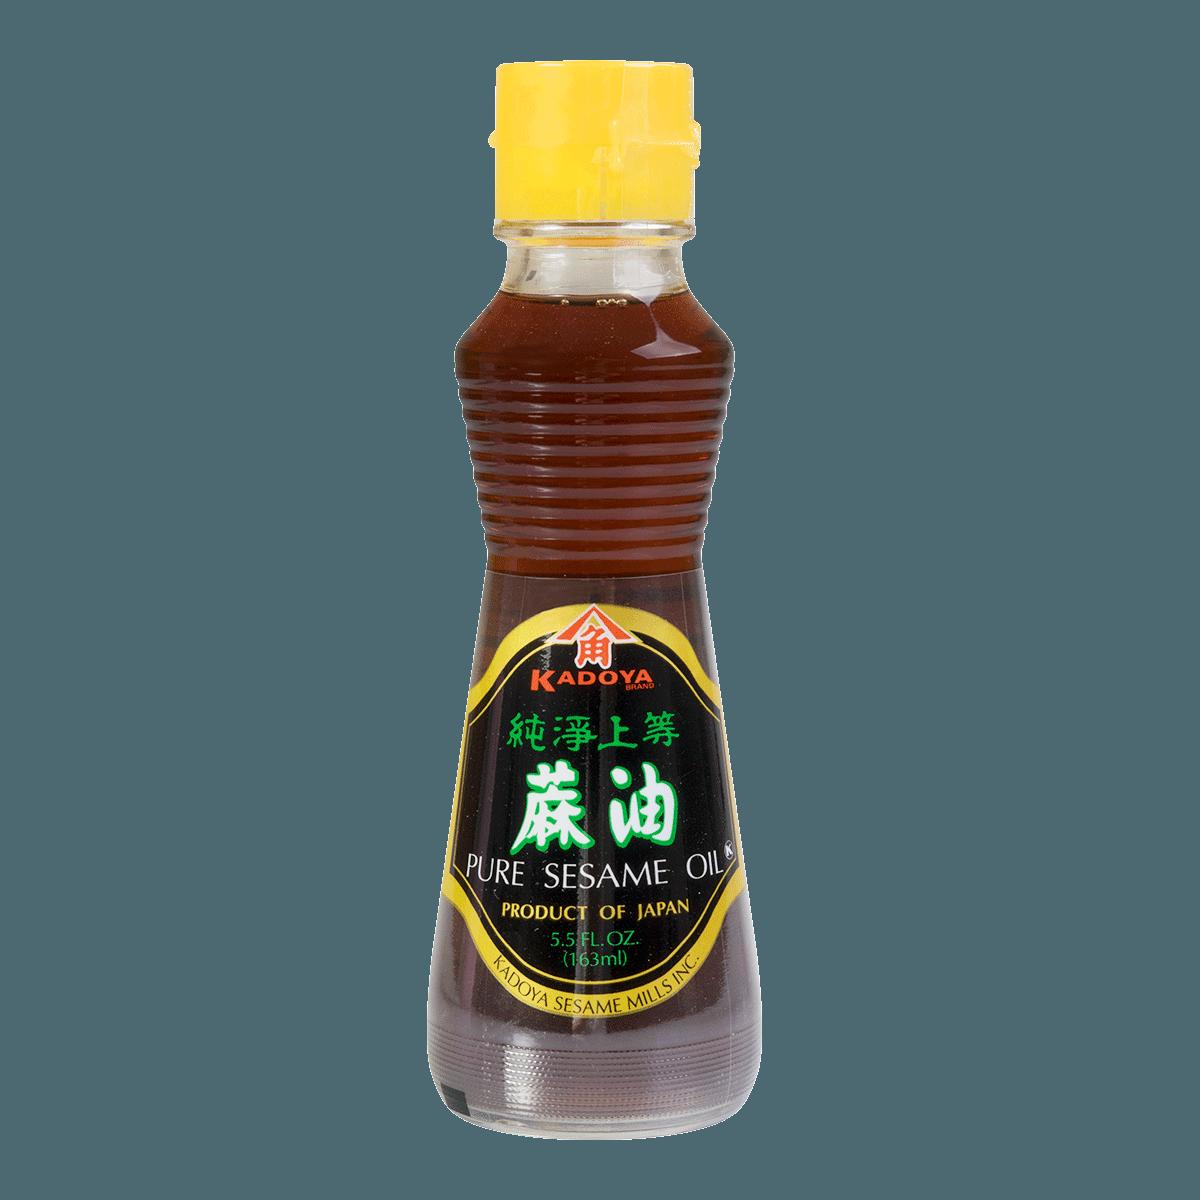 KADOYA Pure Sesame Oil 163ml